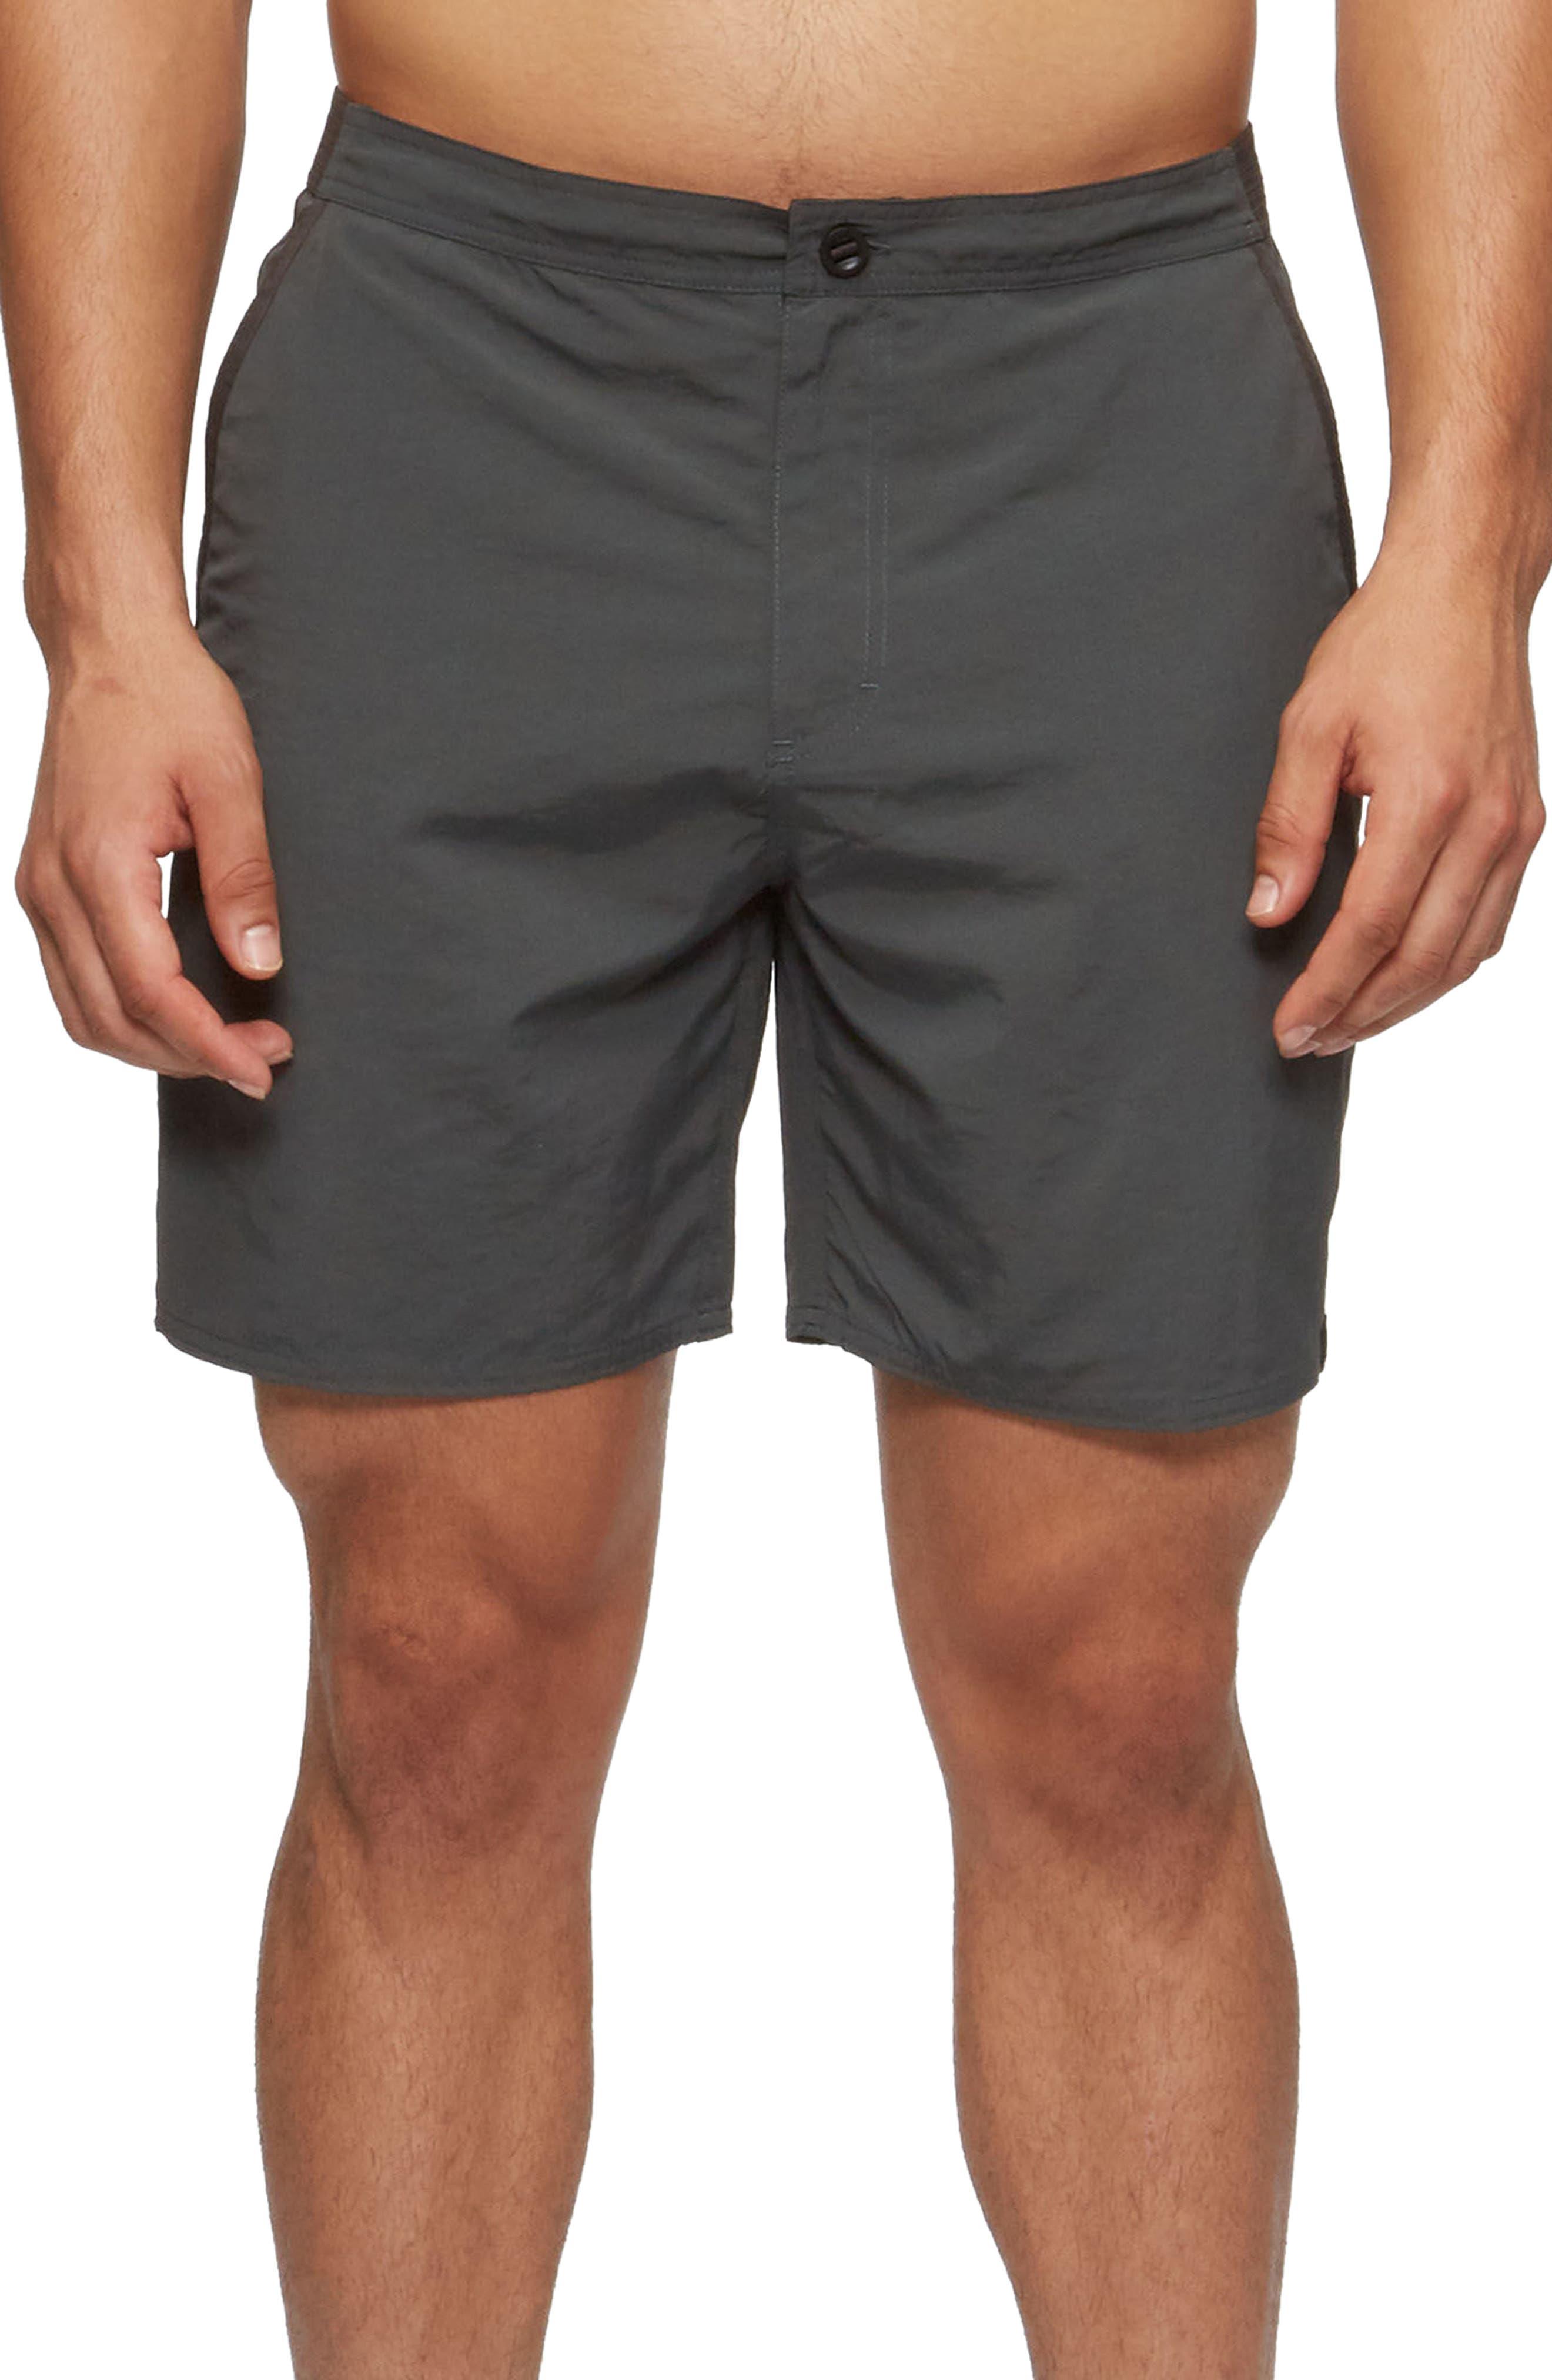 Catera Swim Shorts,                         Main,                         color, Coal Camo